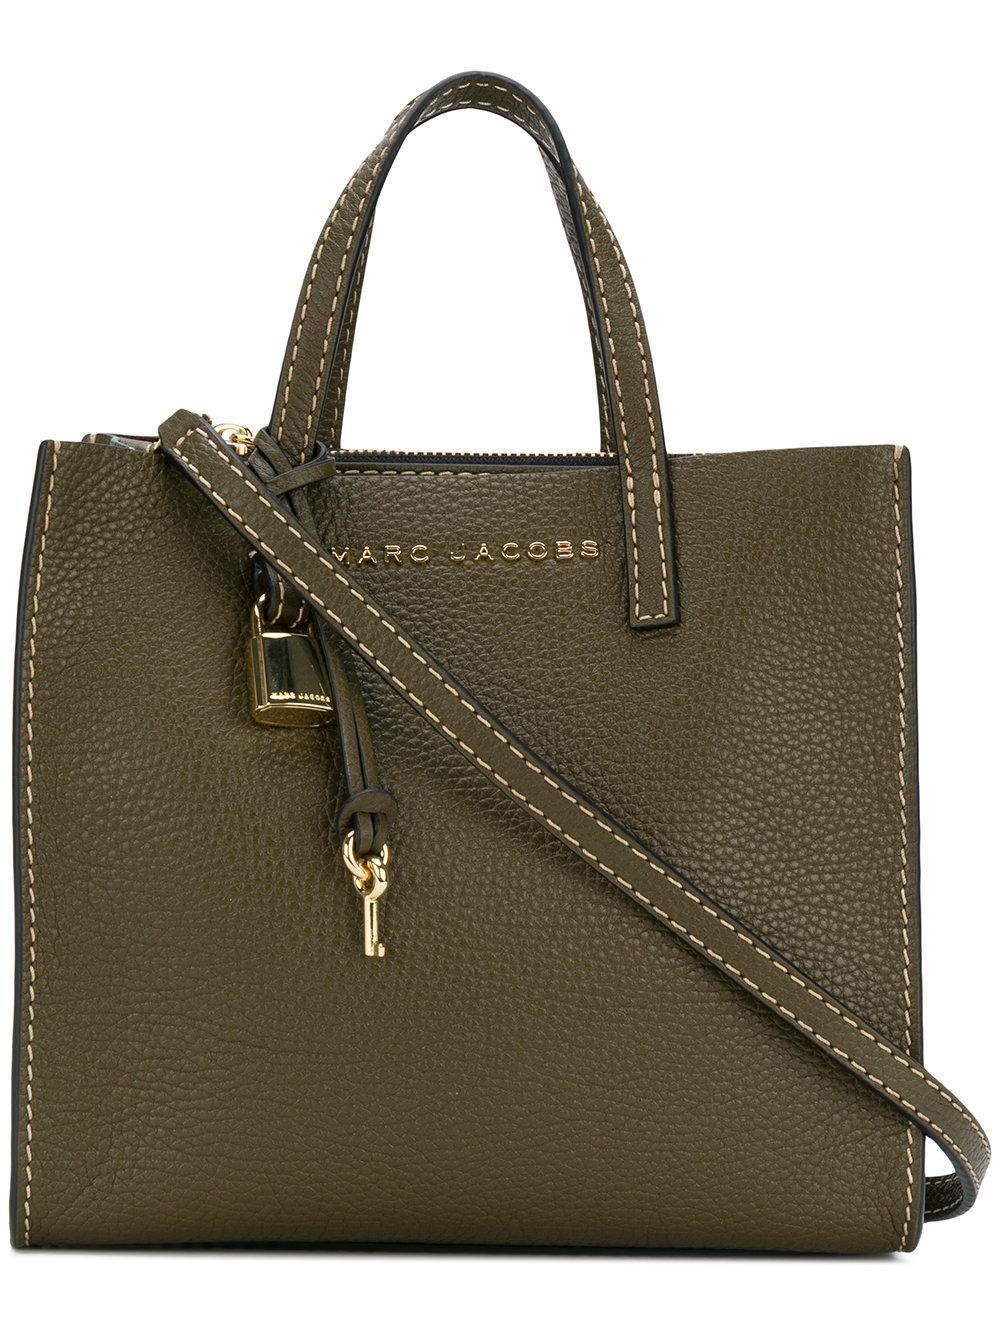 Marc Jacobs The Mini Grind Bag